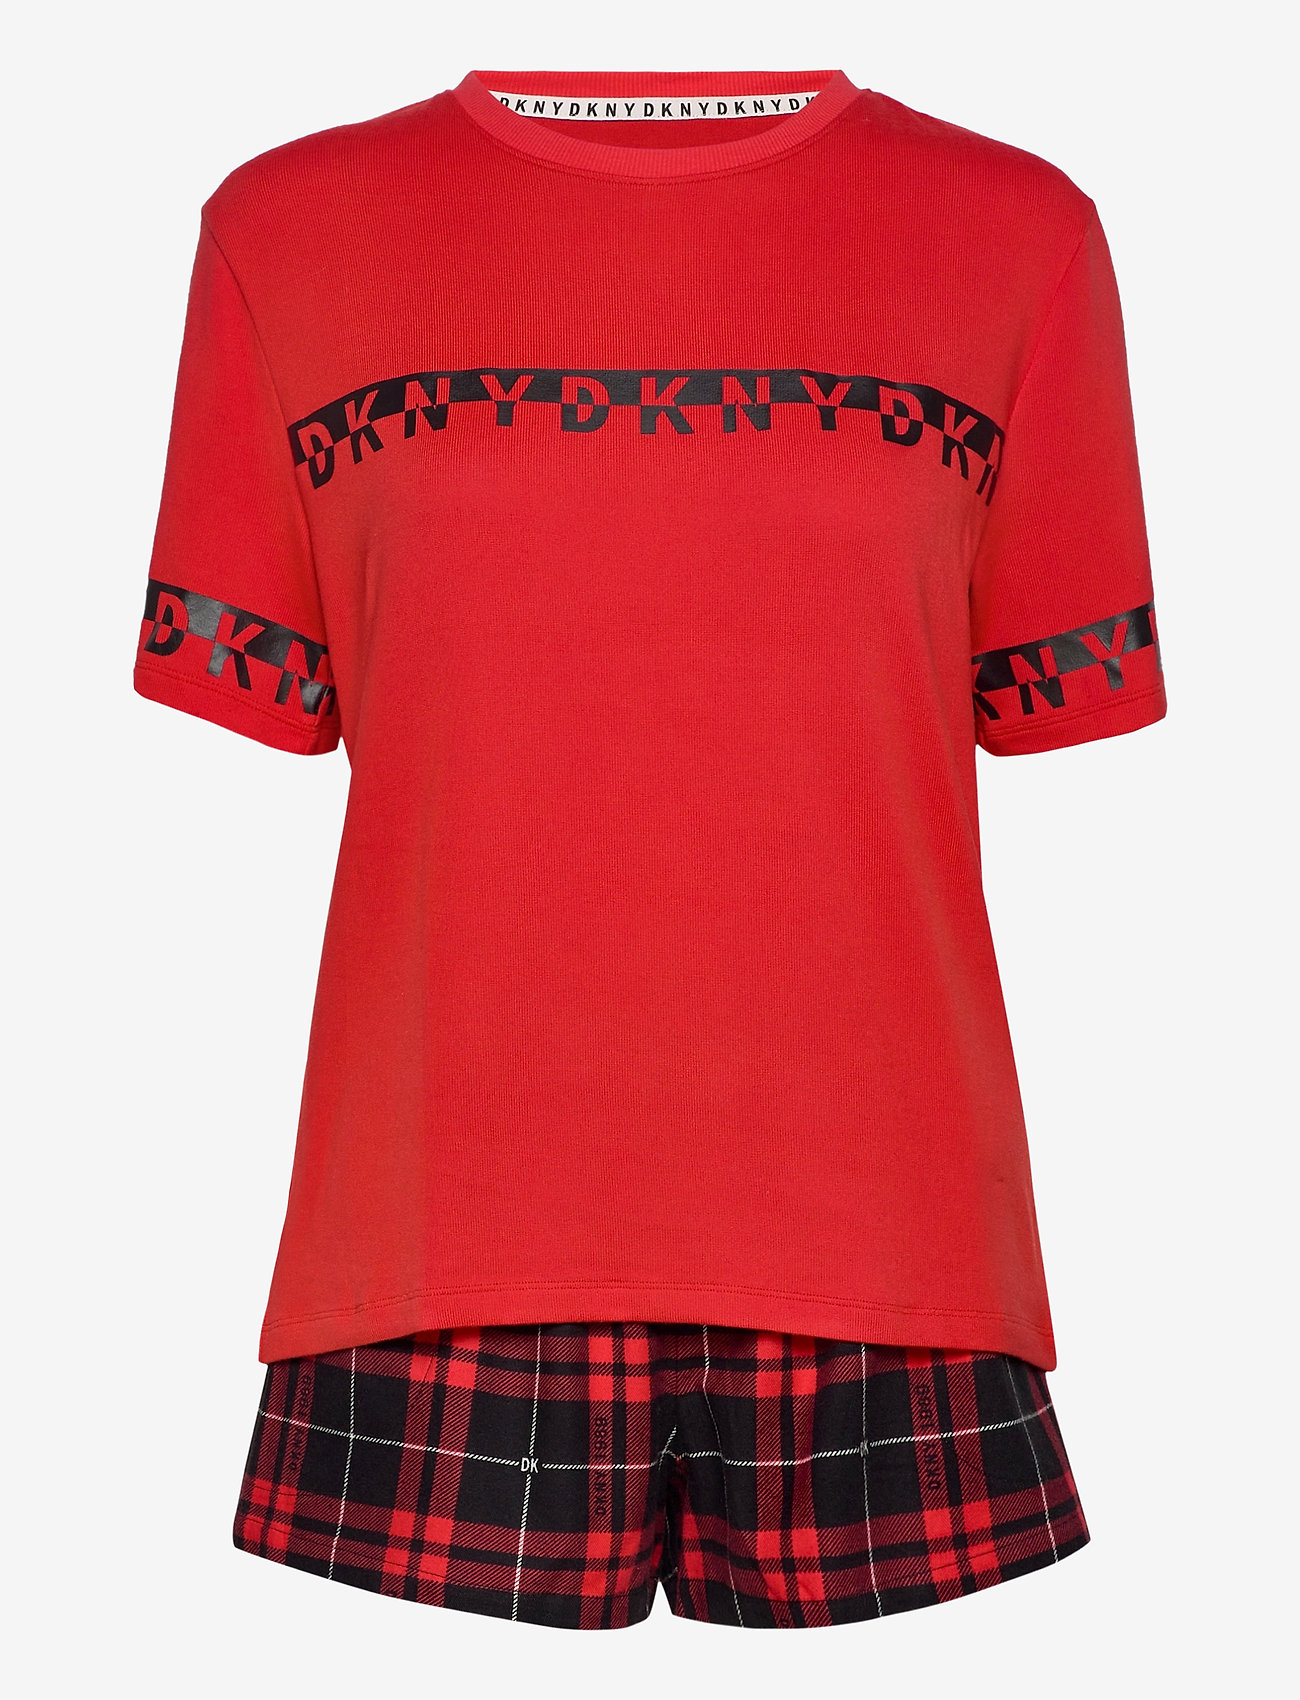 DKNY Homewear - DKNY 100% DKNY TOP, BOXER & EYEMASK BOX - pyjama''s - ruby check - 0